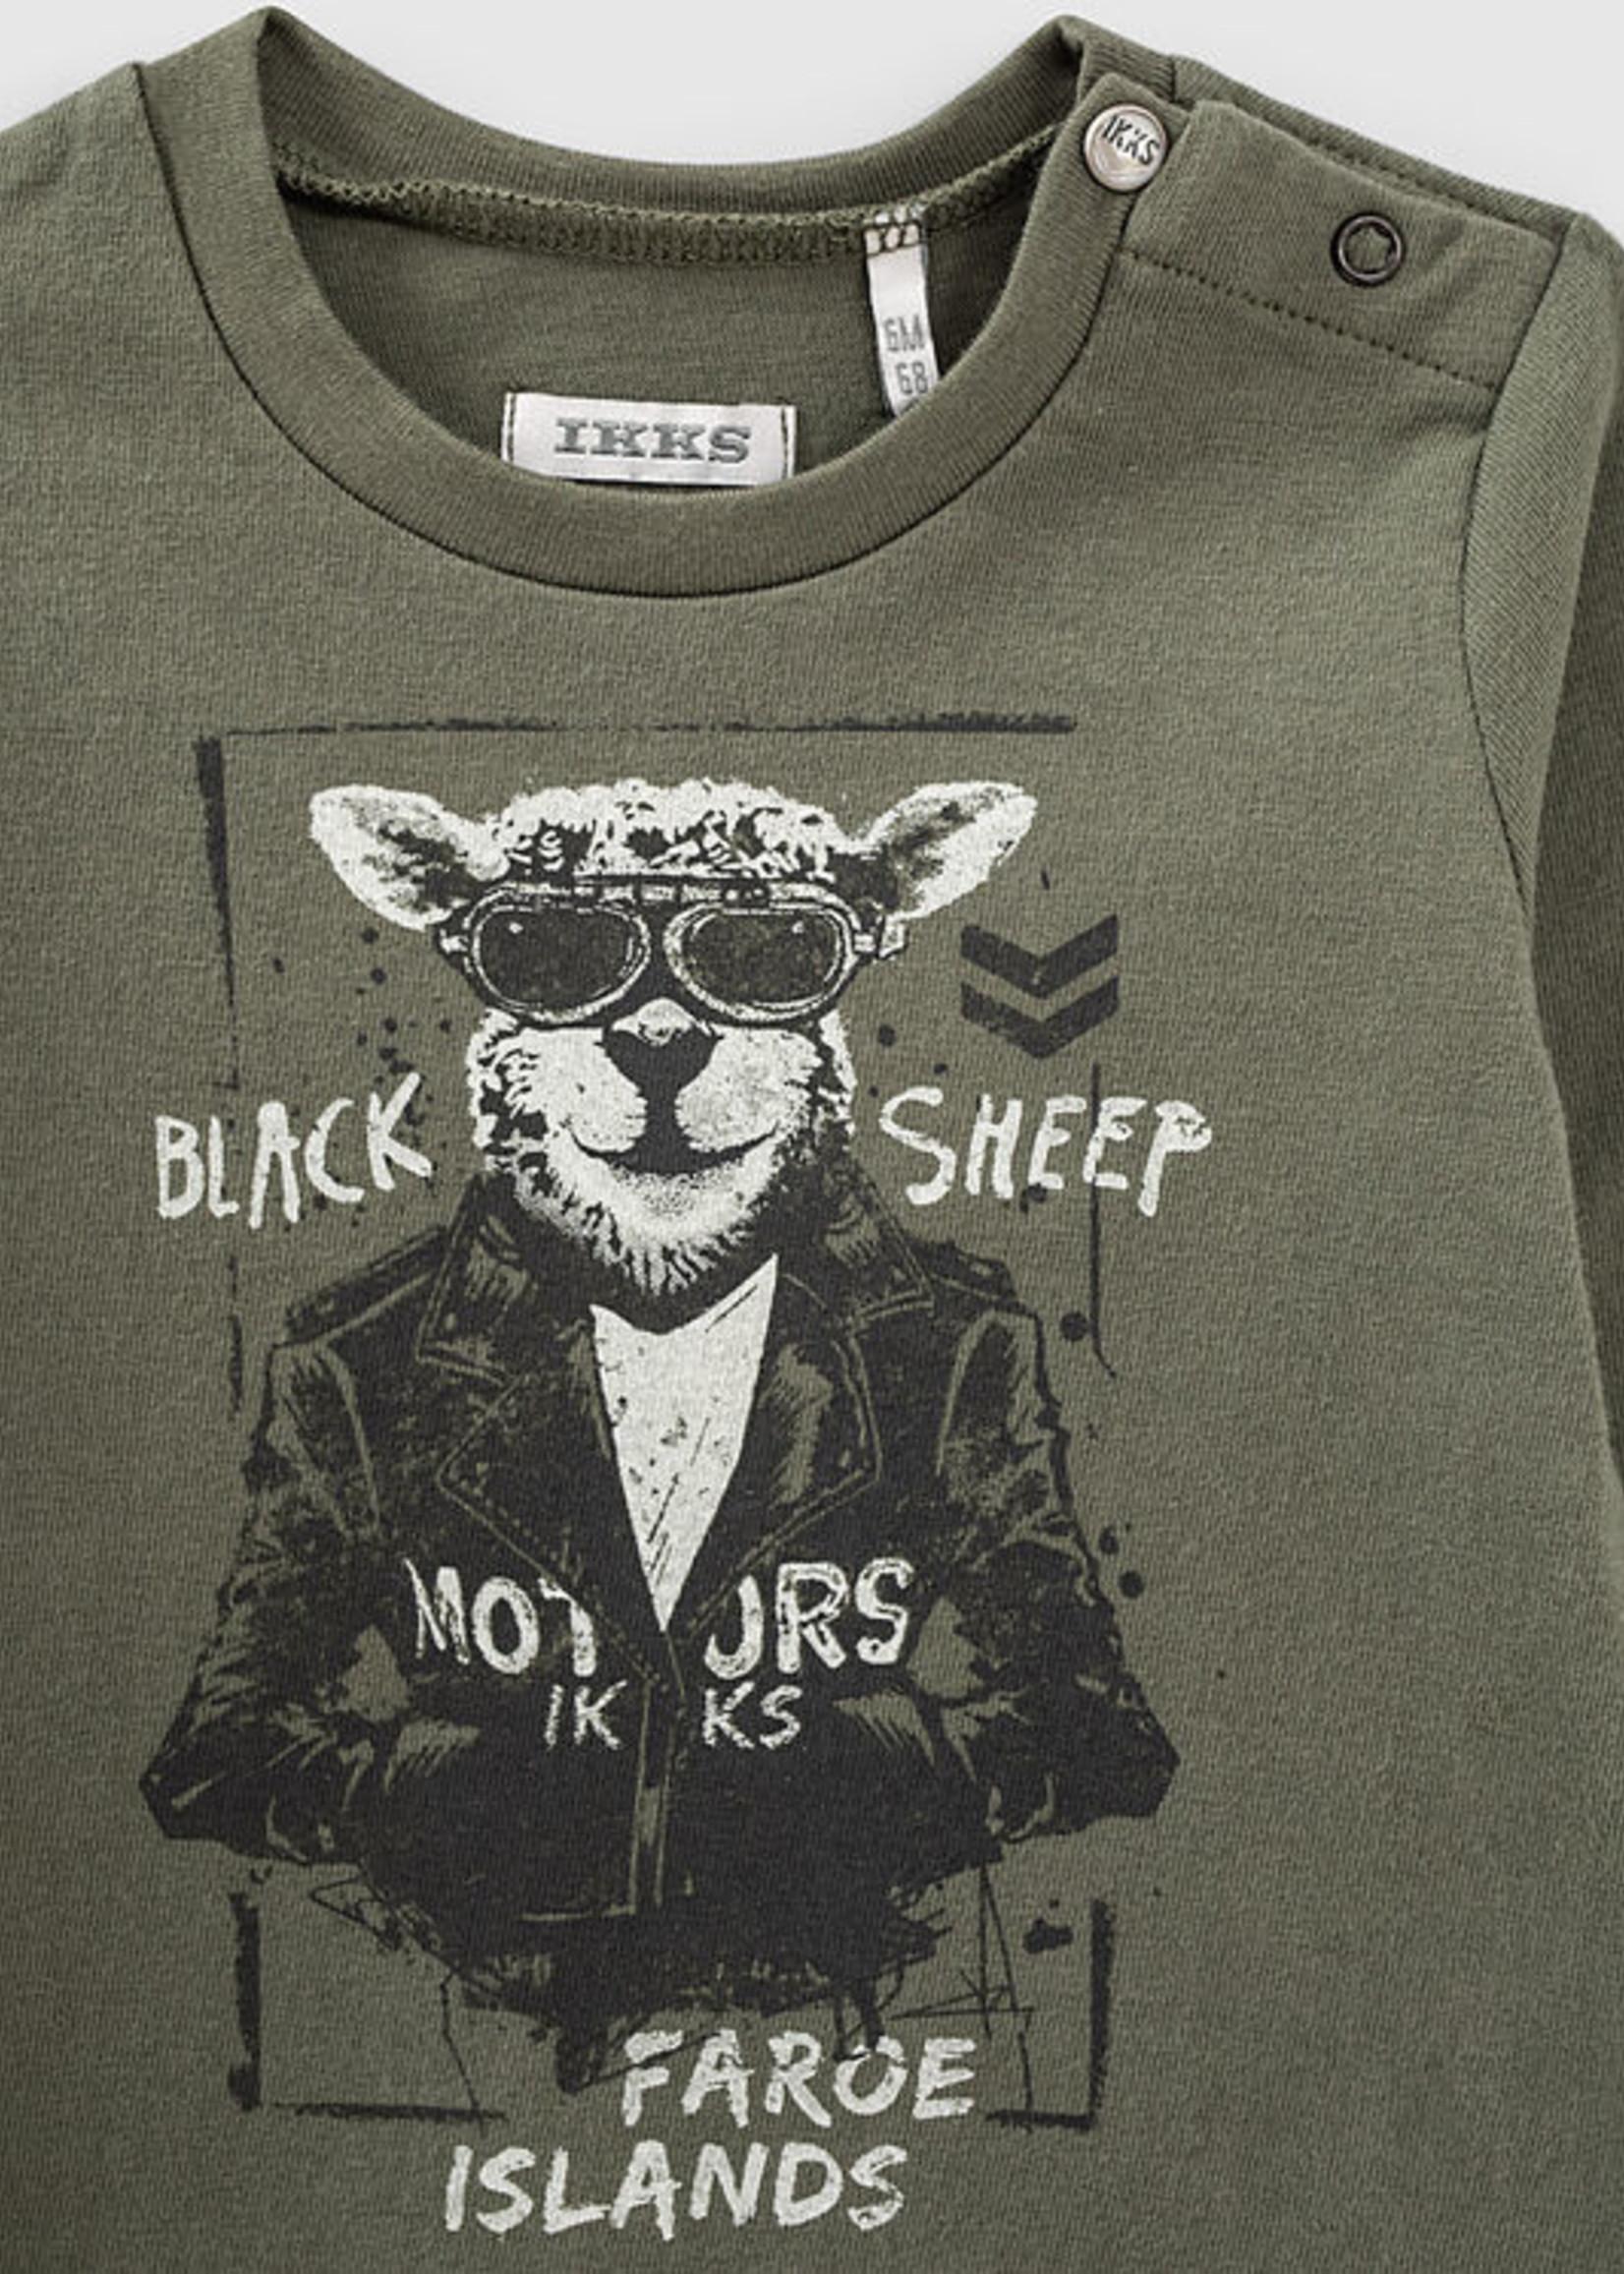 IKKS IKKS black sheep shirt